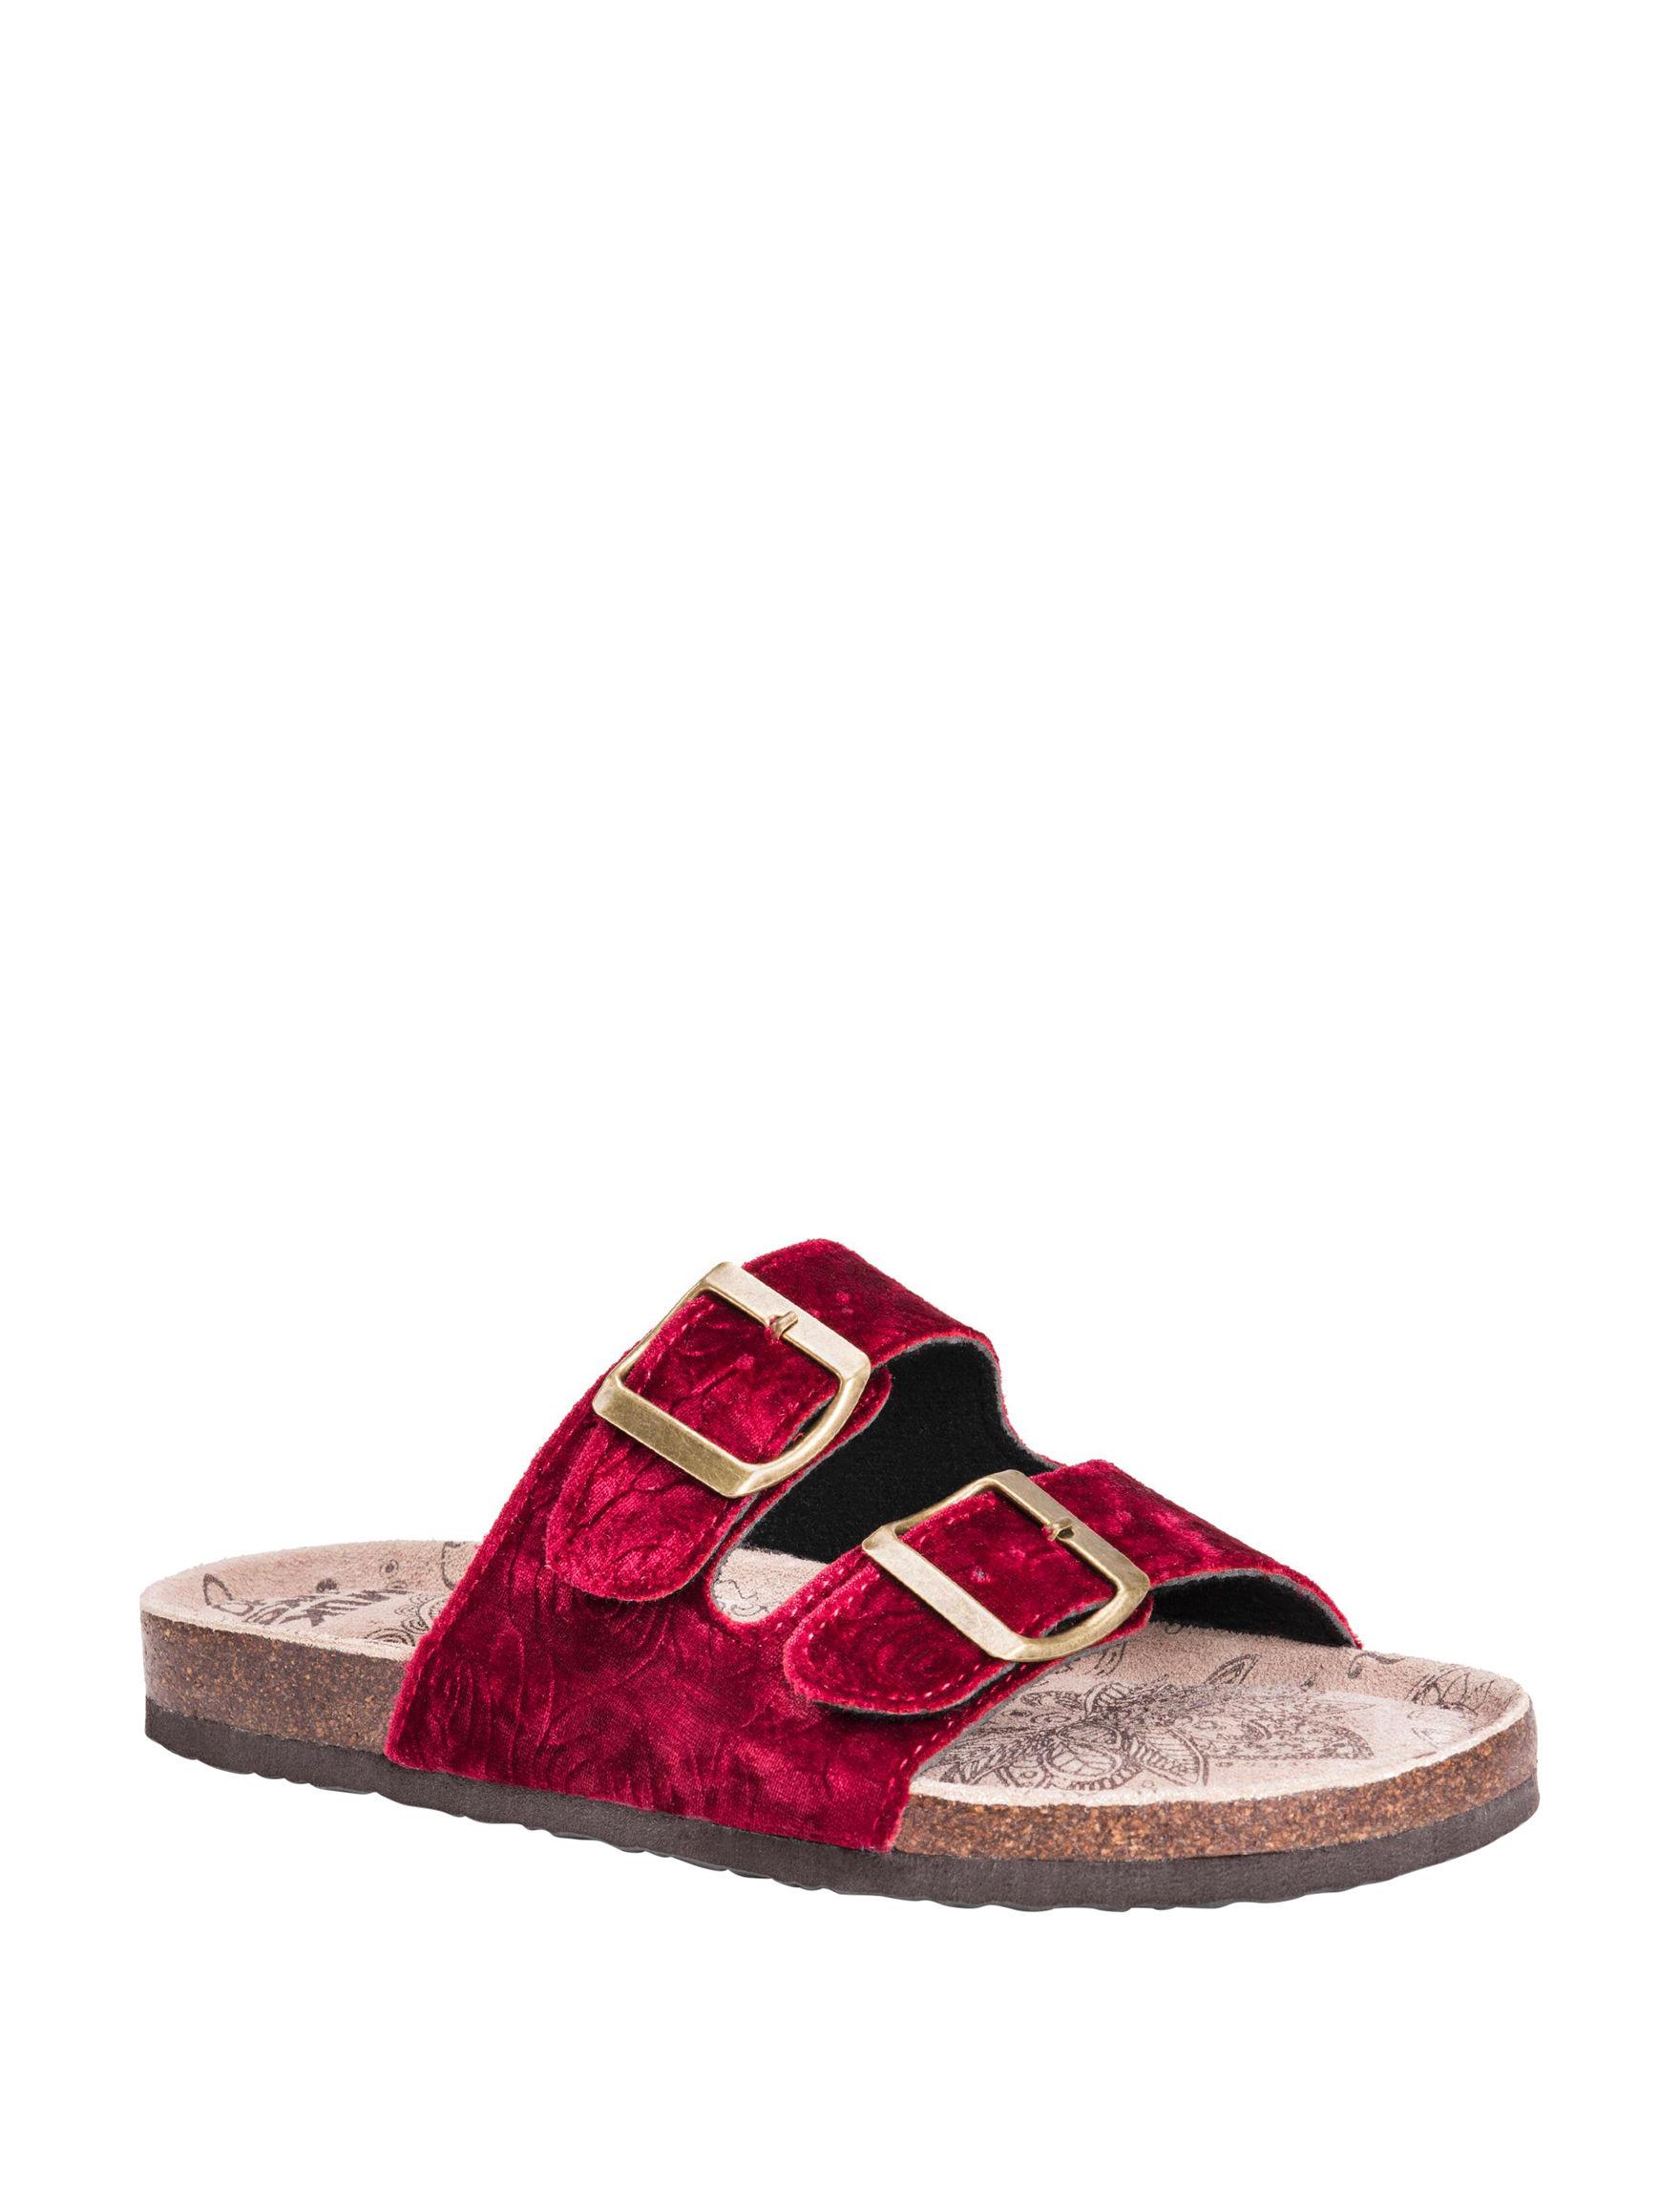 Muk Luks Red Flat Sandals Slide Sandals